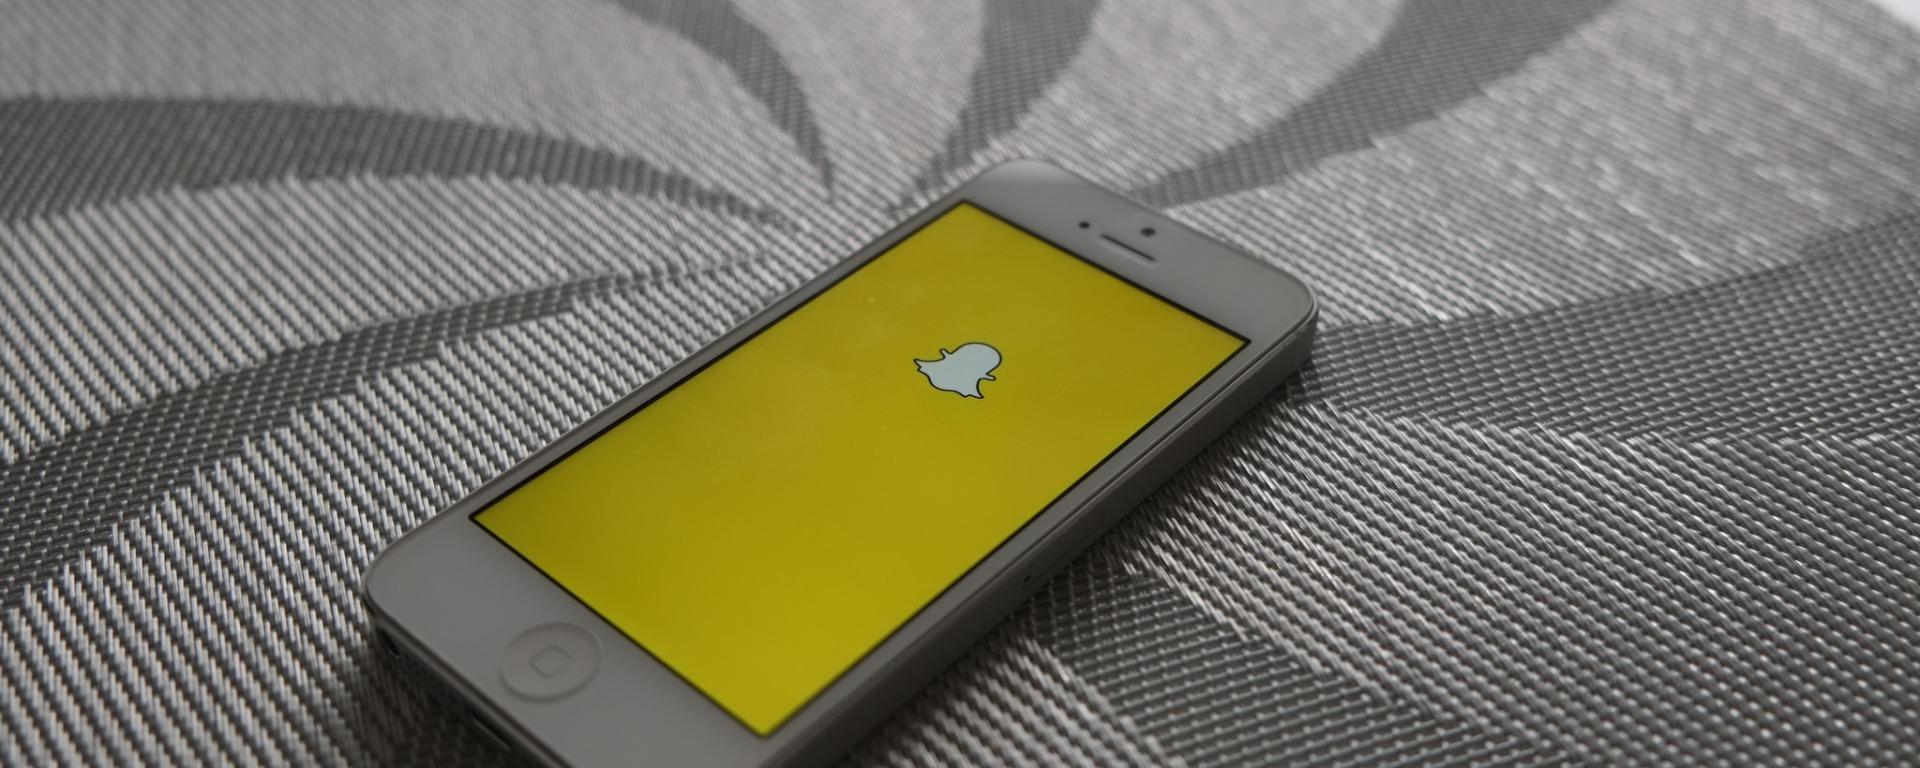 Snapchat en el móvil